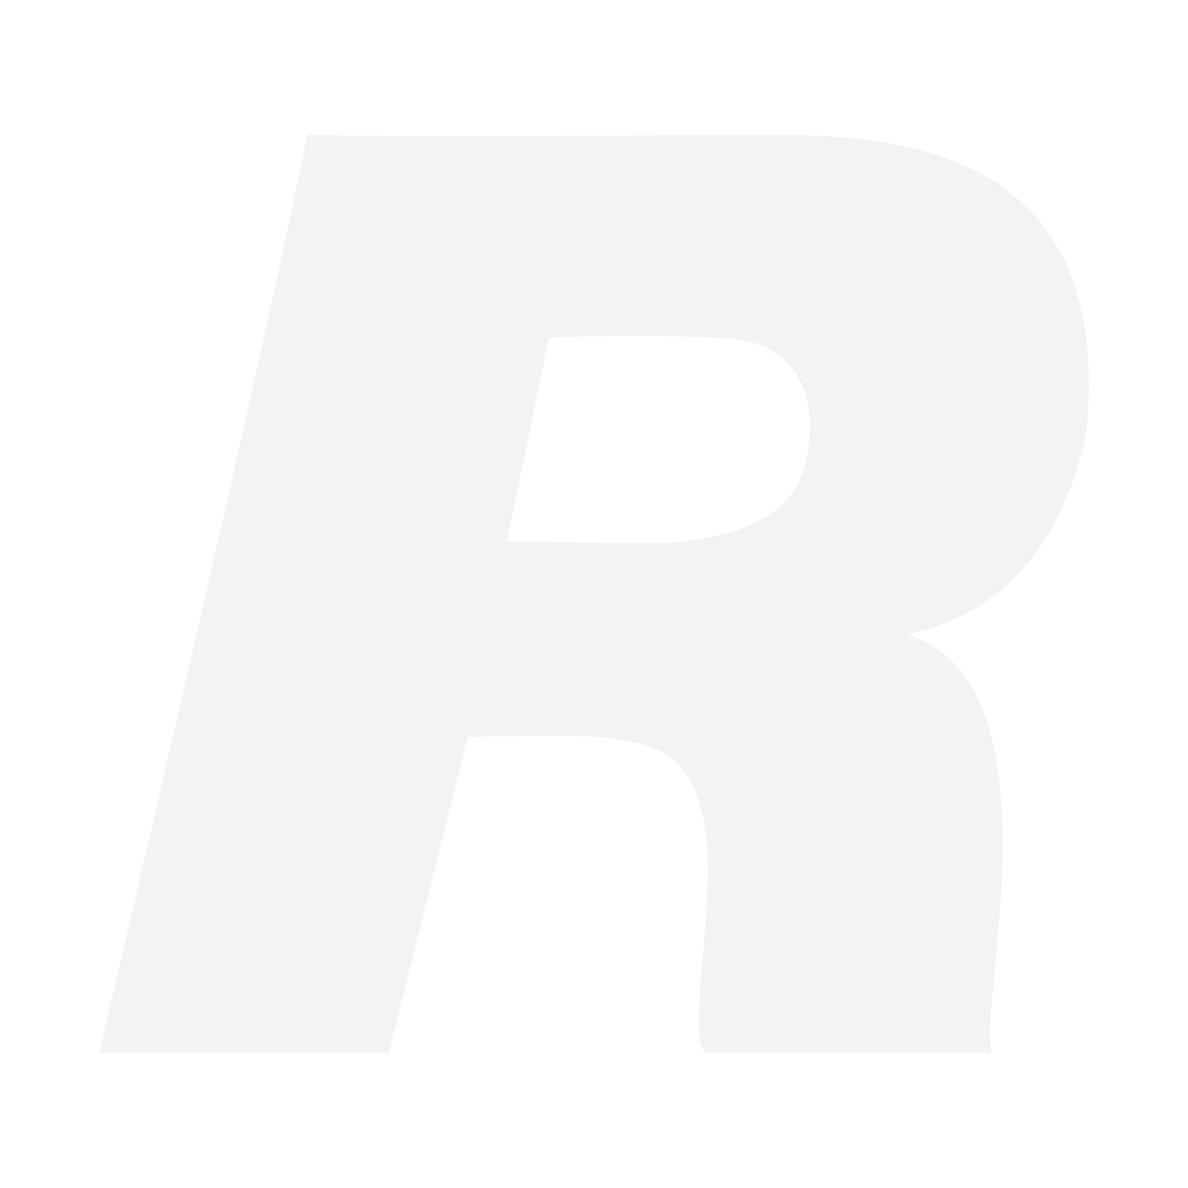 OLYMPUS HLD-7 AKKUKAHVA (E-M1) KÄYTETTY (SIS.ALV.24%)